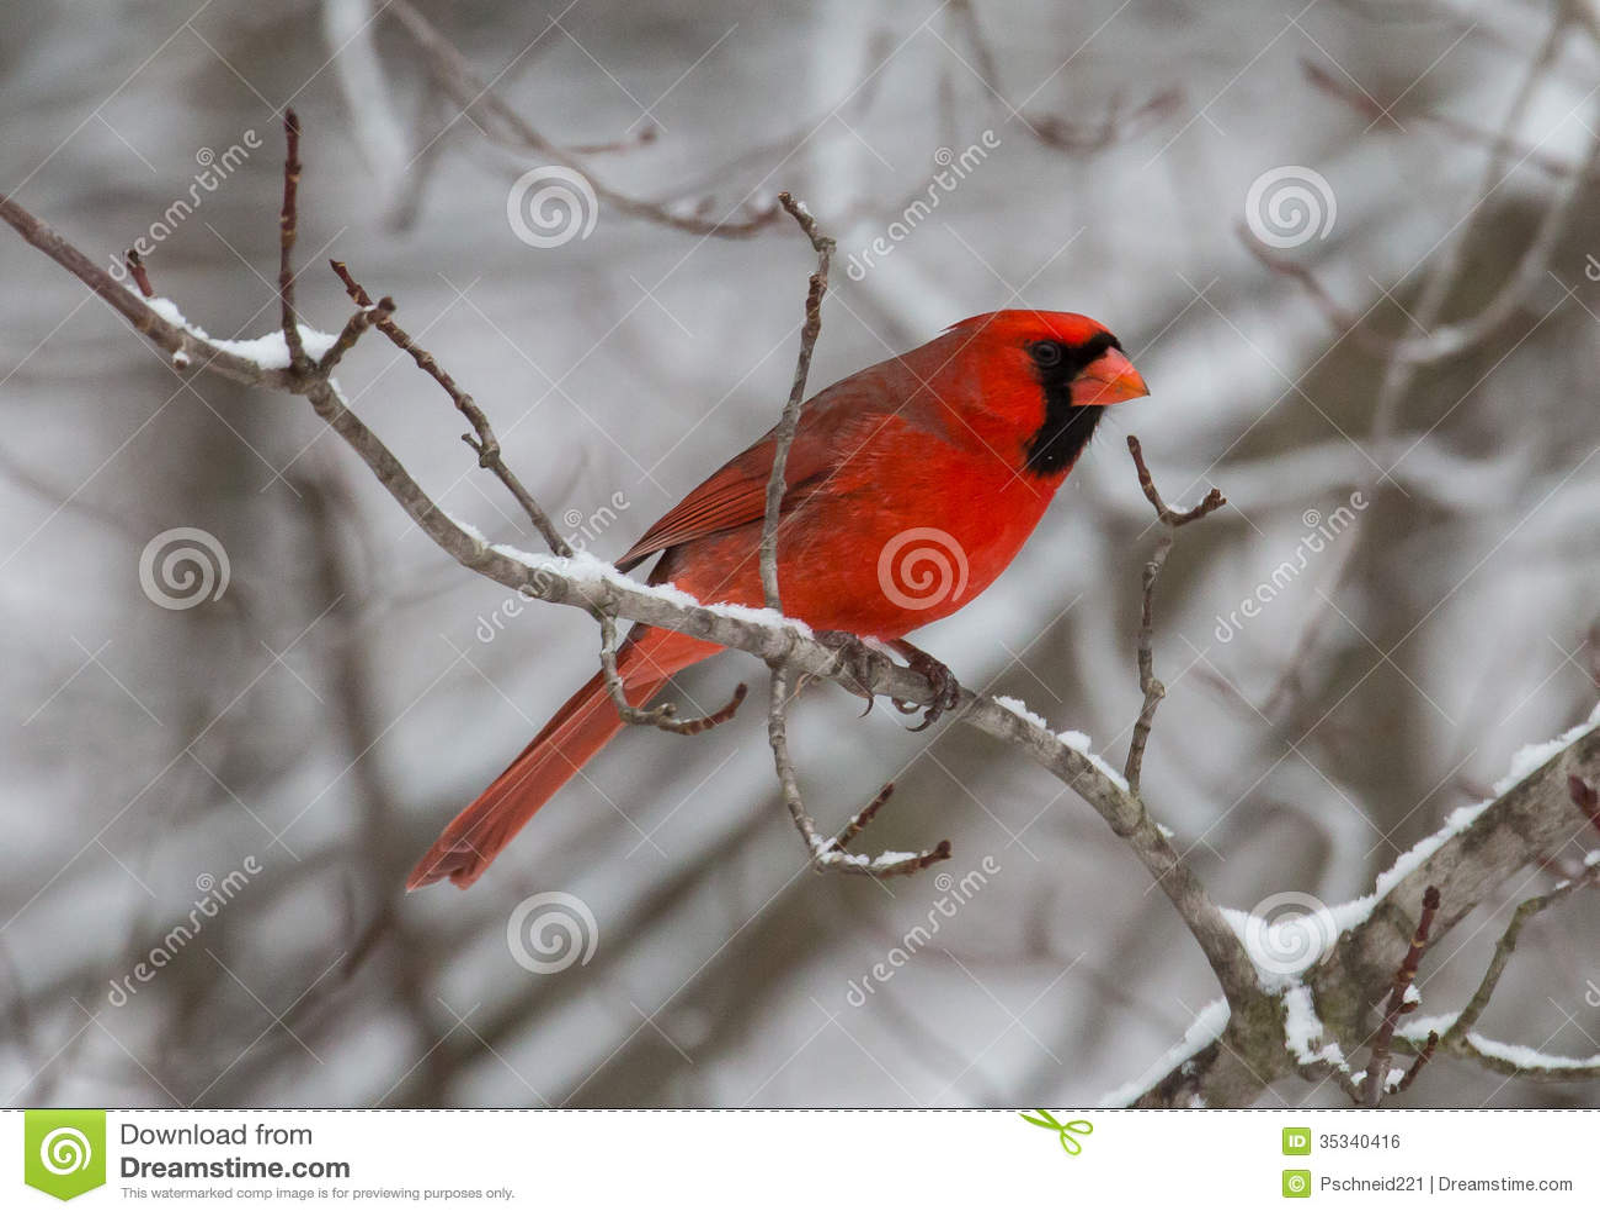 Cute Moose Wallpaper Red Cardinal Bird In Winter Royalty Free Stock Image